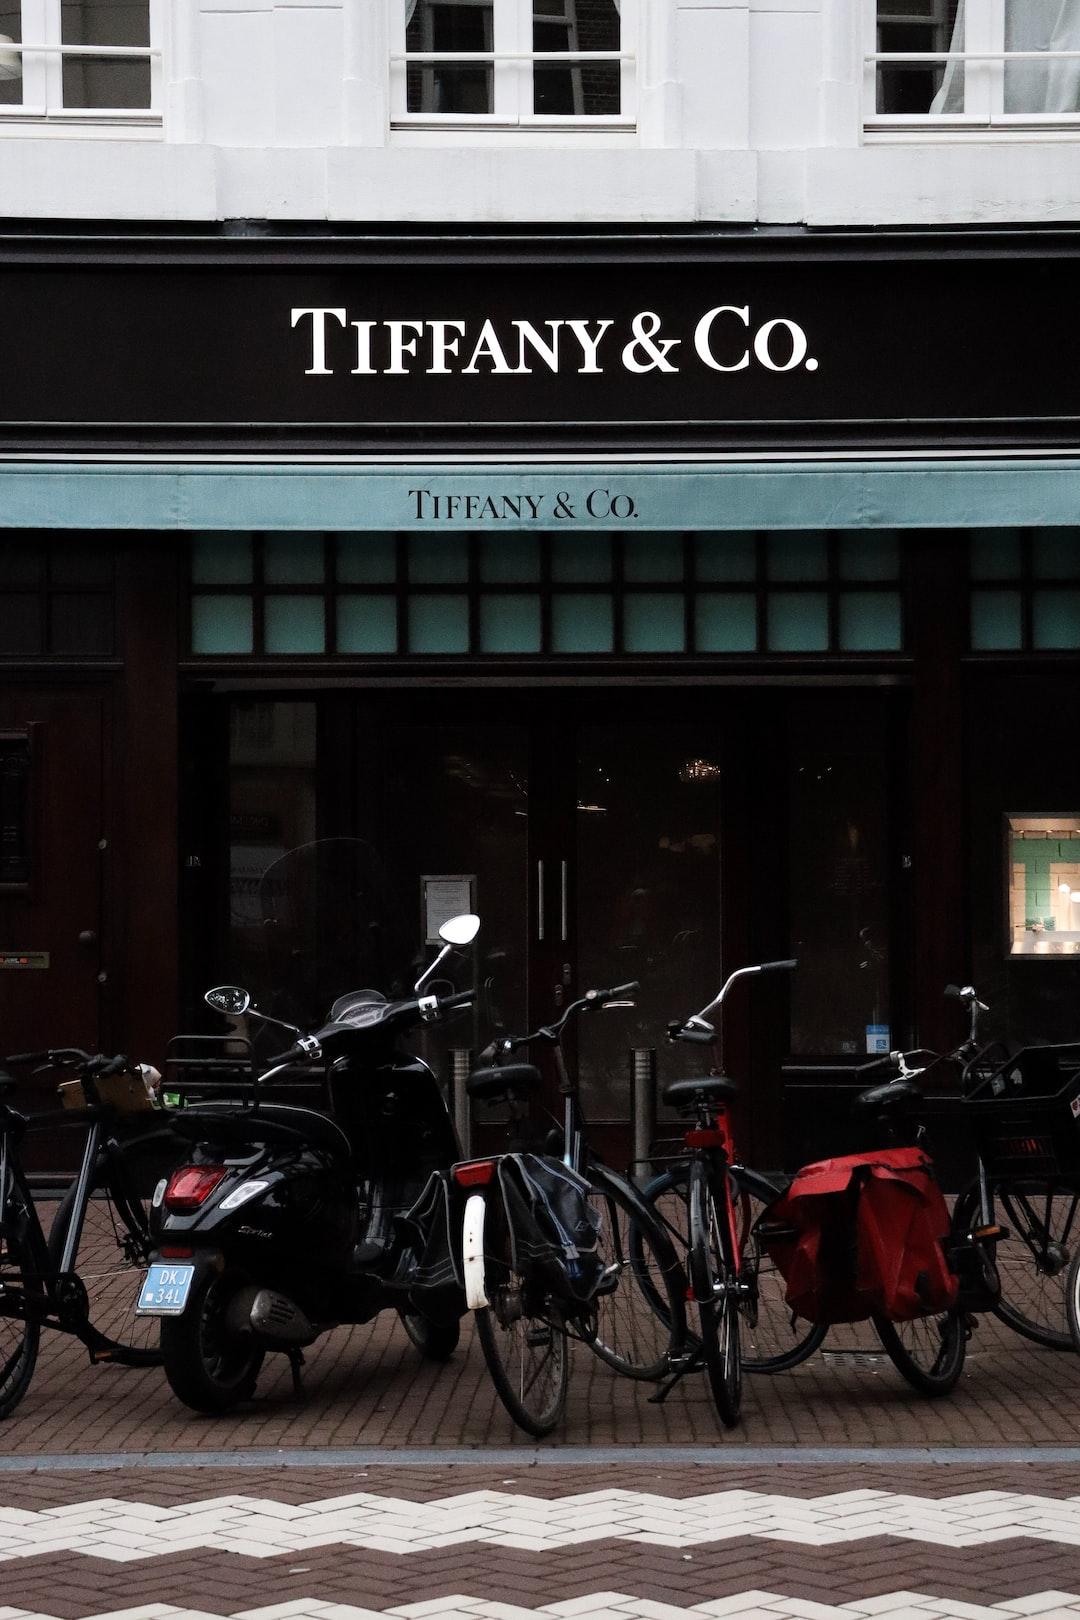 tiffany & co, amsterdam, the netherlands